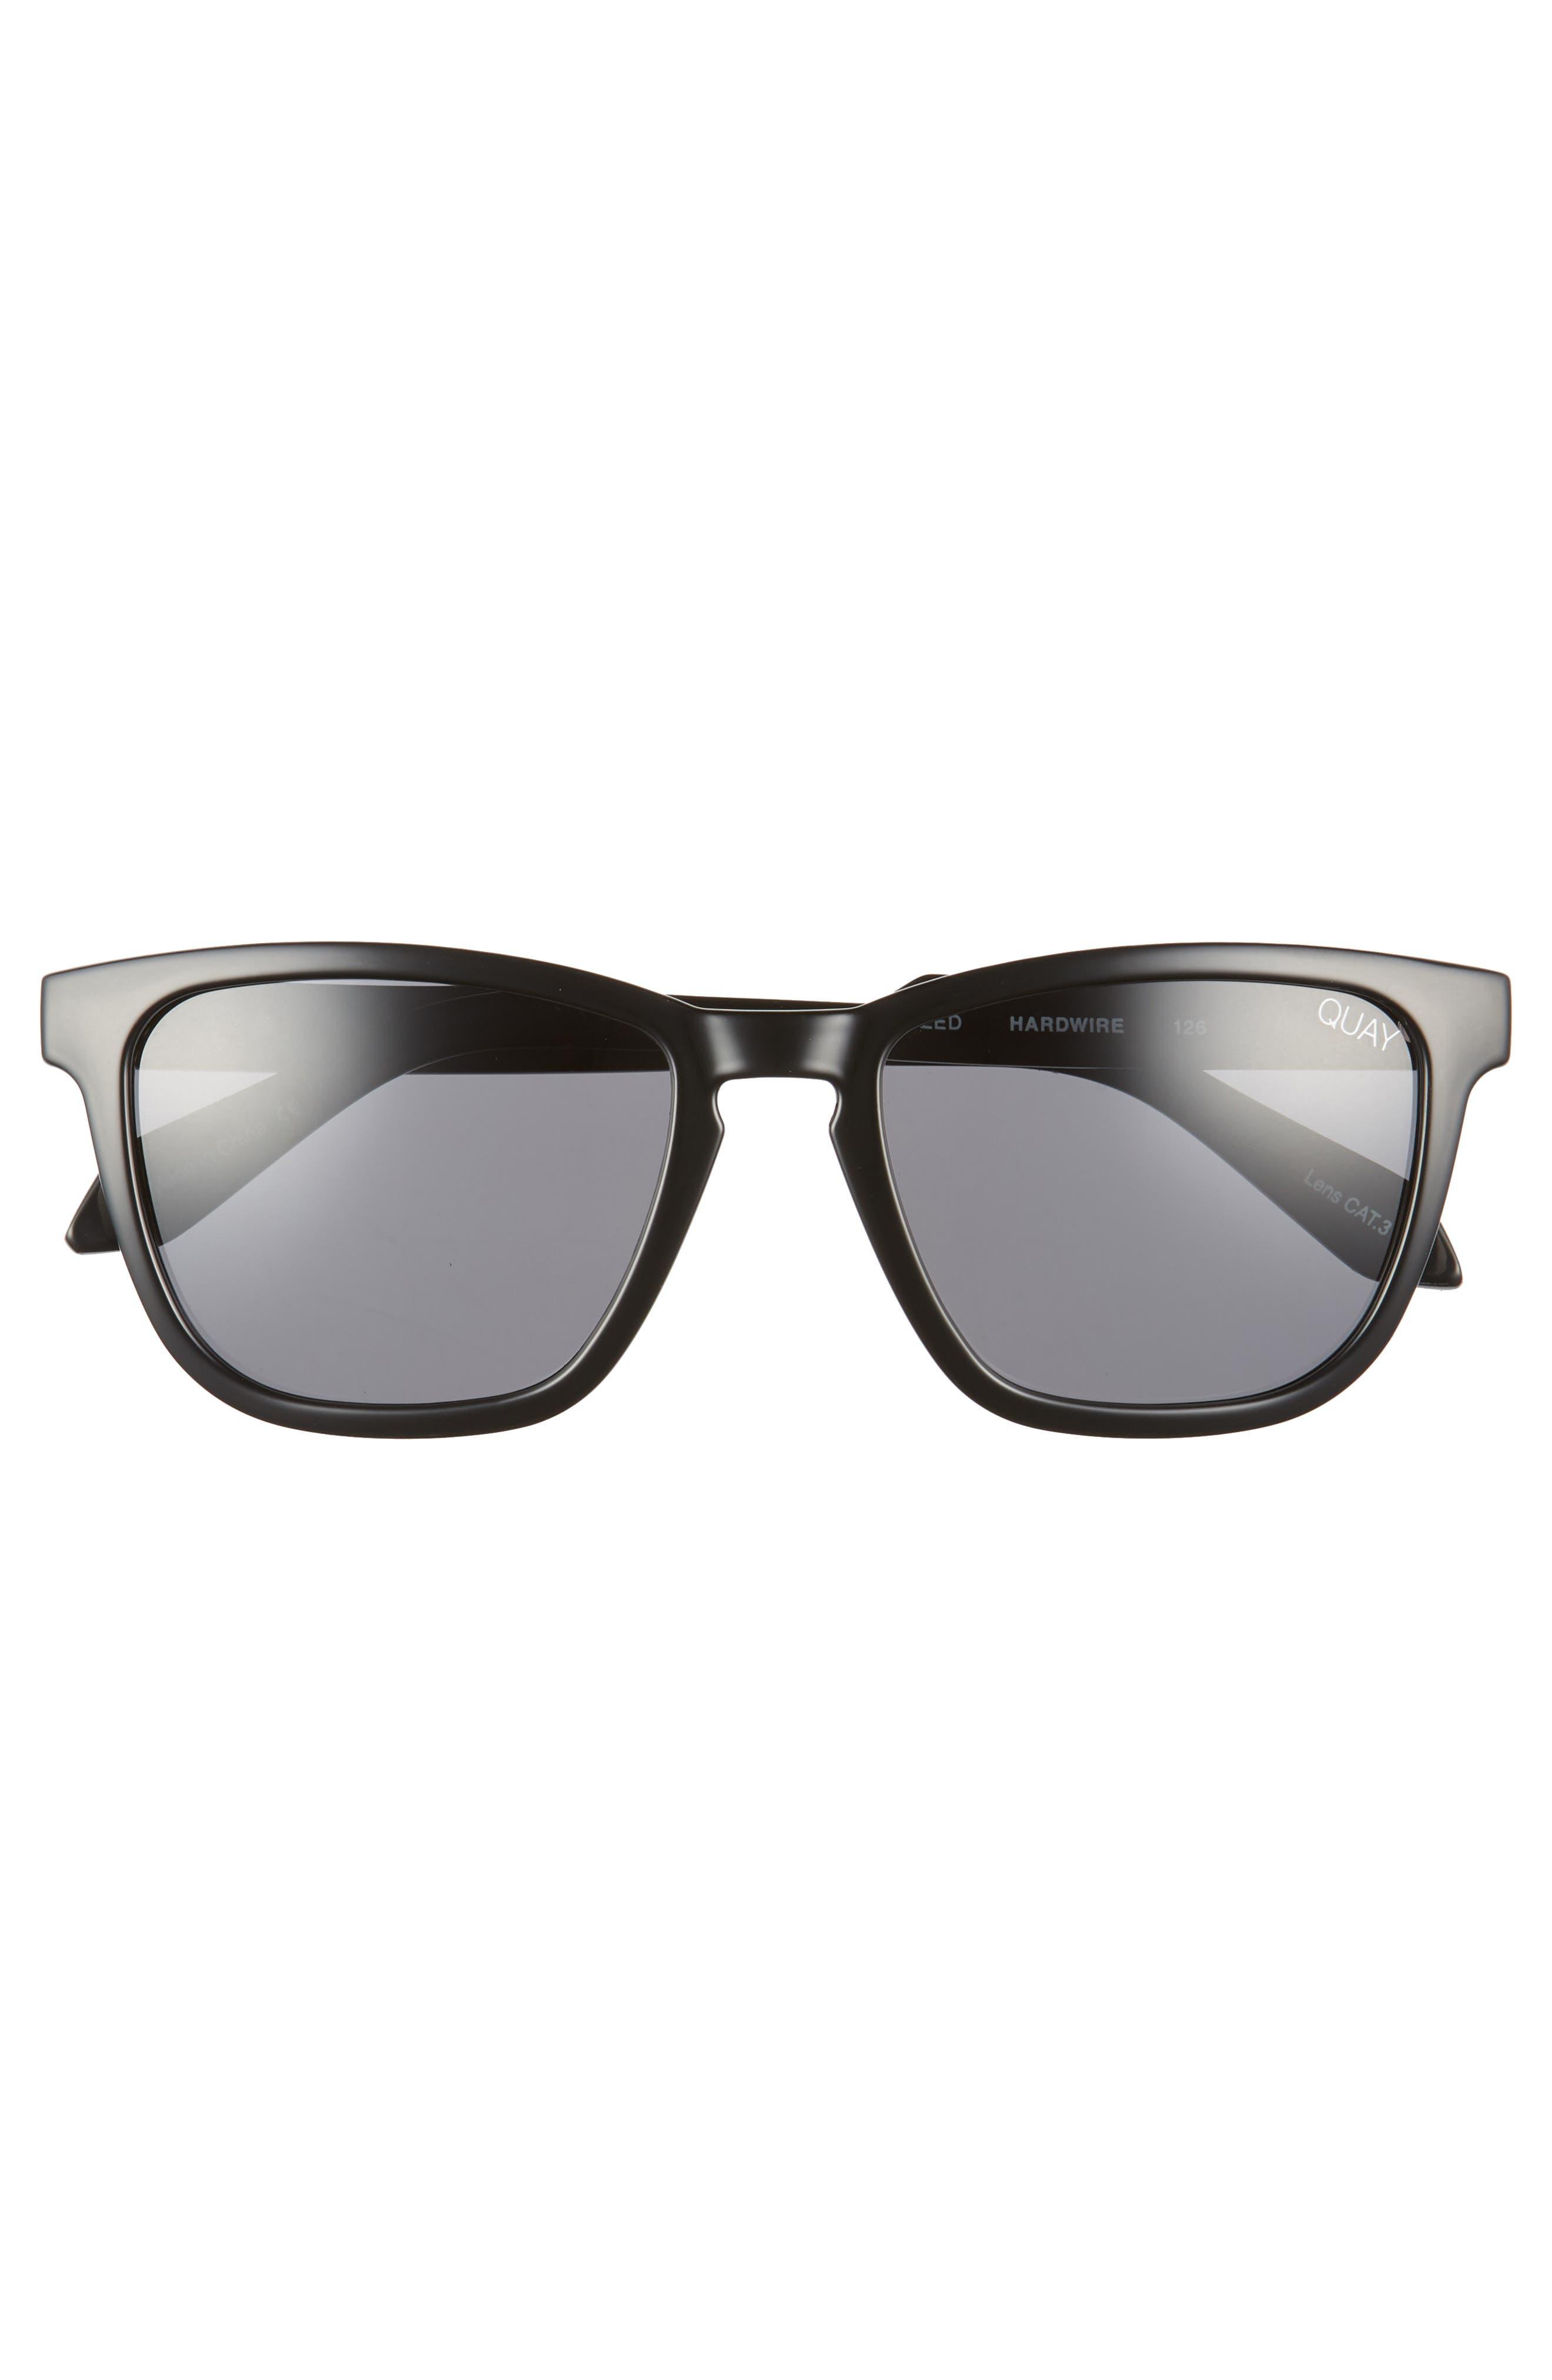 Hardwire 54mm Polarized Sunglasses,                             Alternate thumbnail 3, color,                             BLACK/ SMOKE LENS